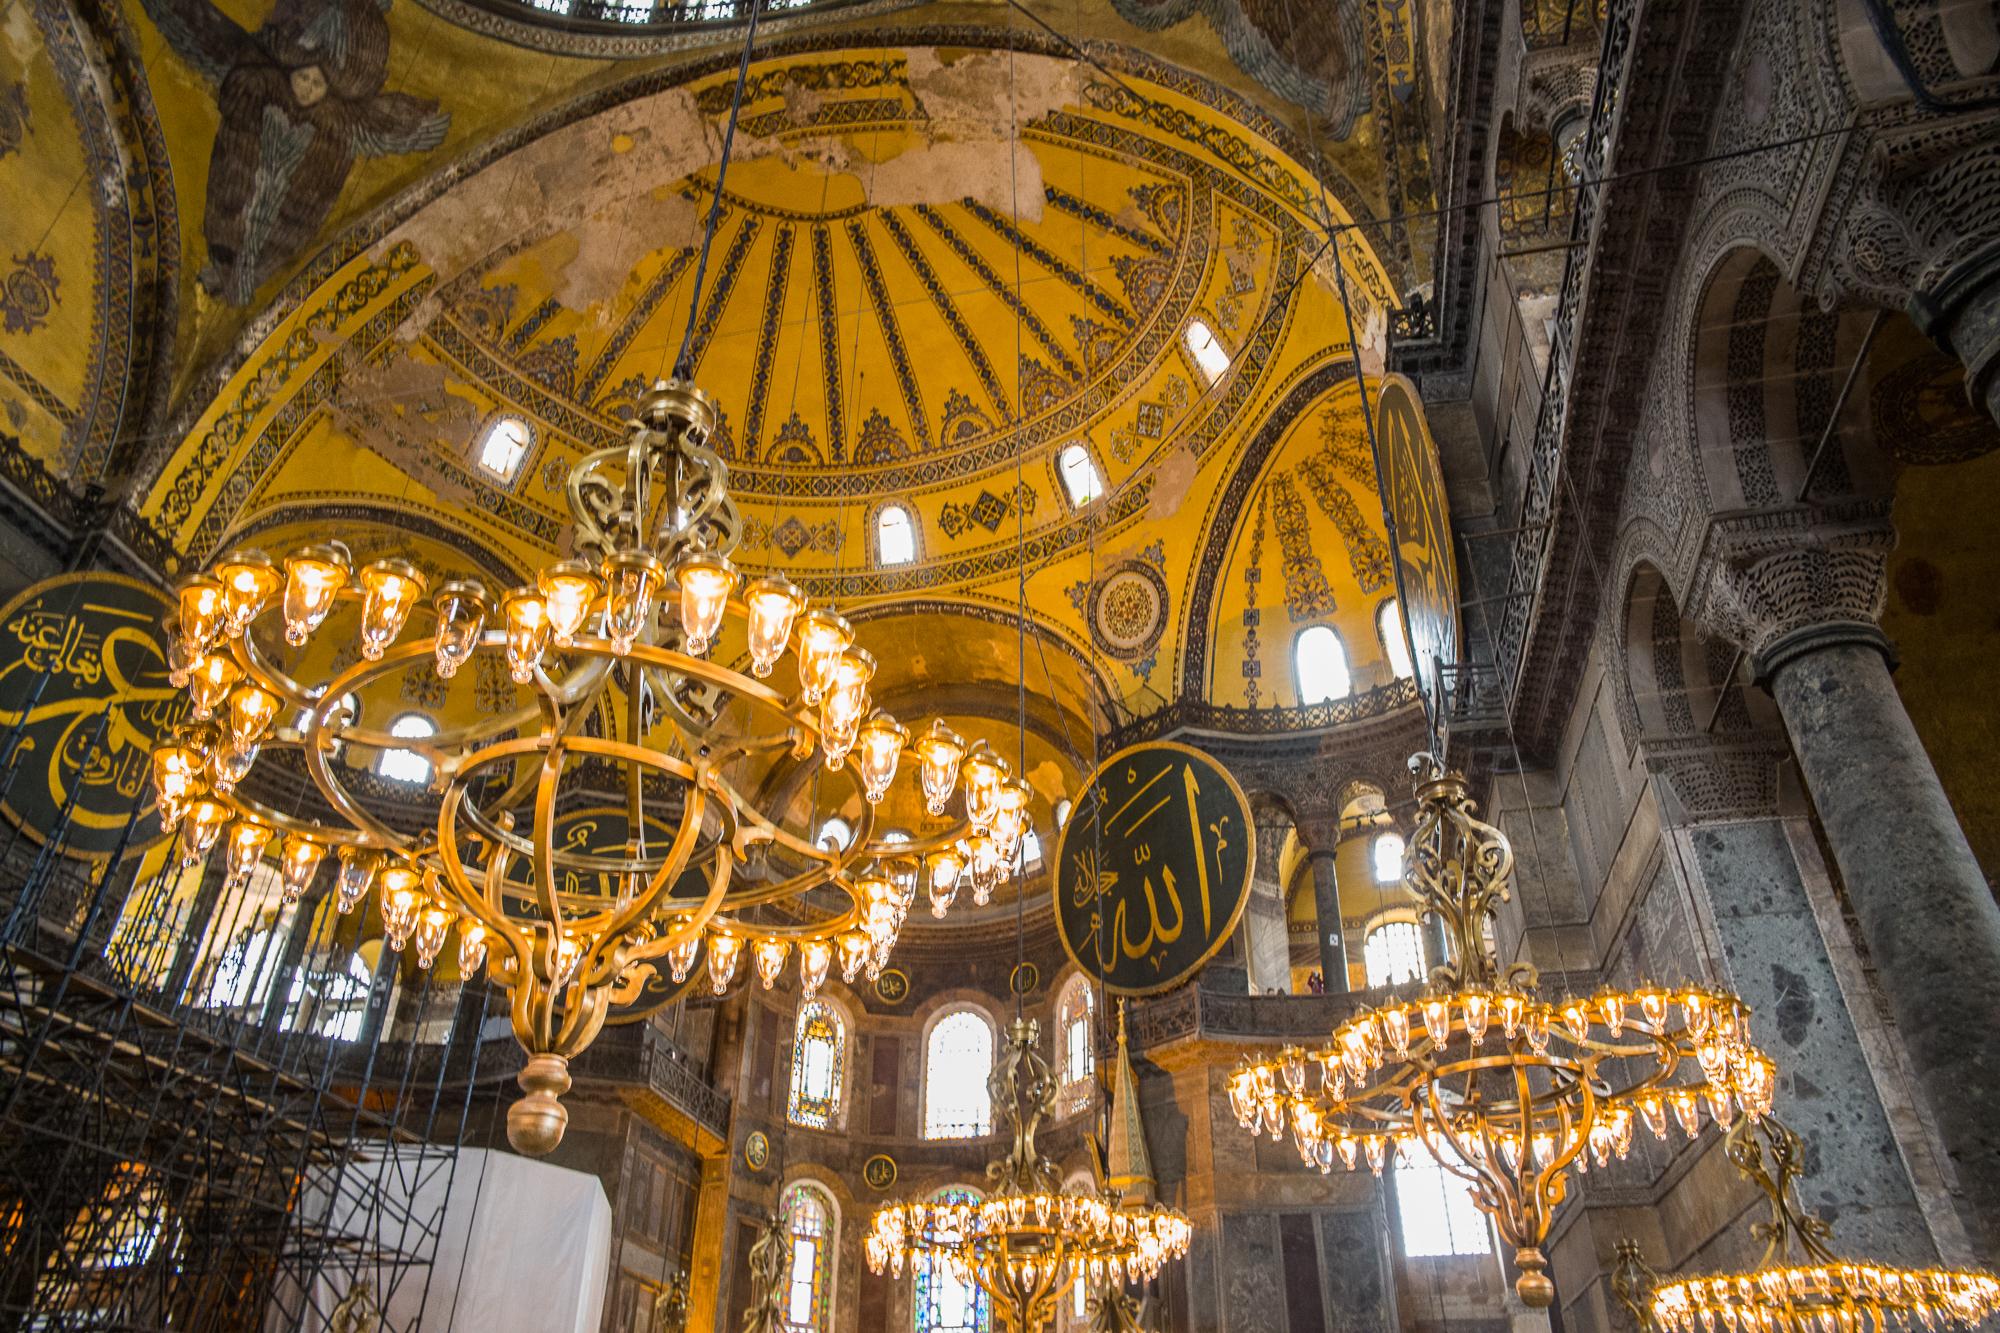 Looking up in the Hagia Sophia